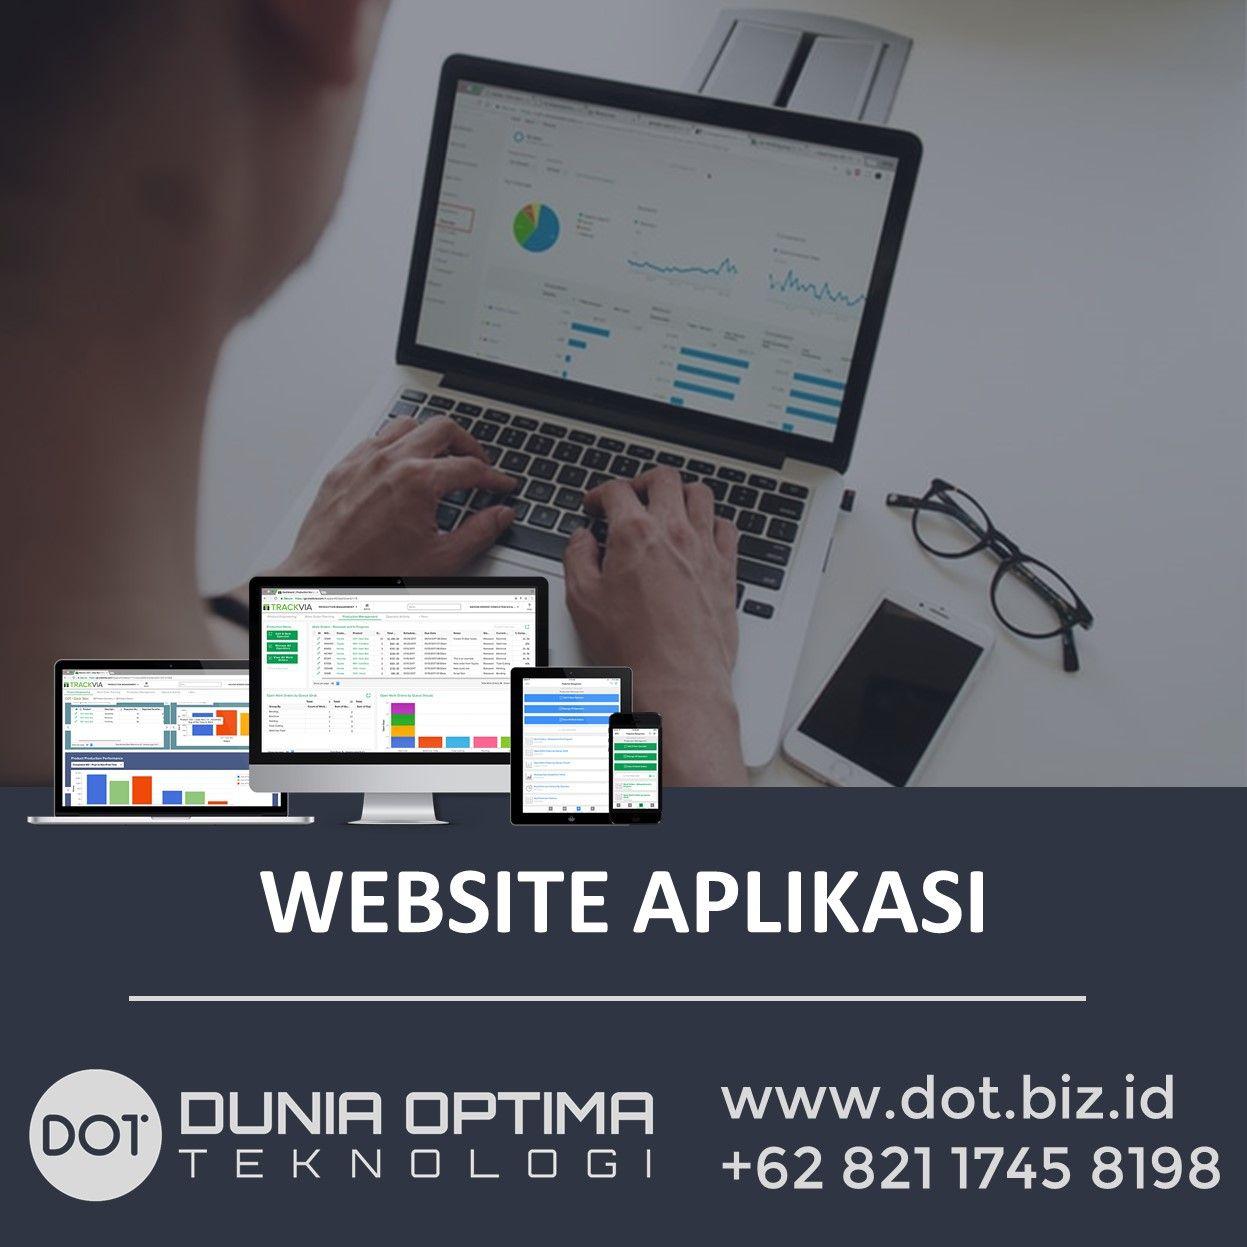 Website Aplikasi Aplikasi Web Human Resources Teknologi